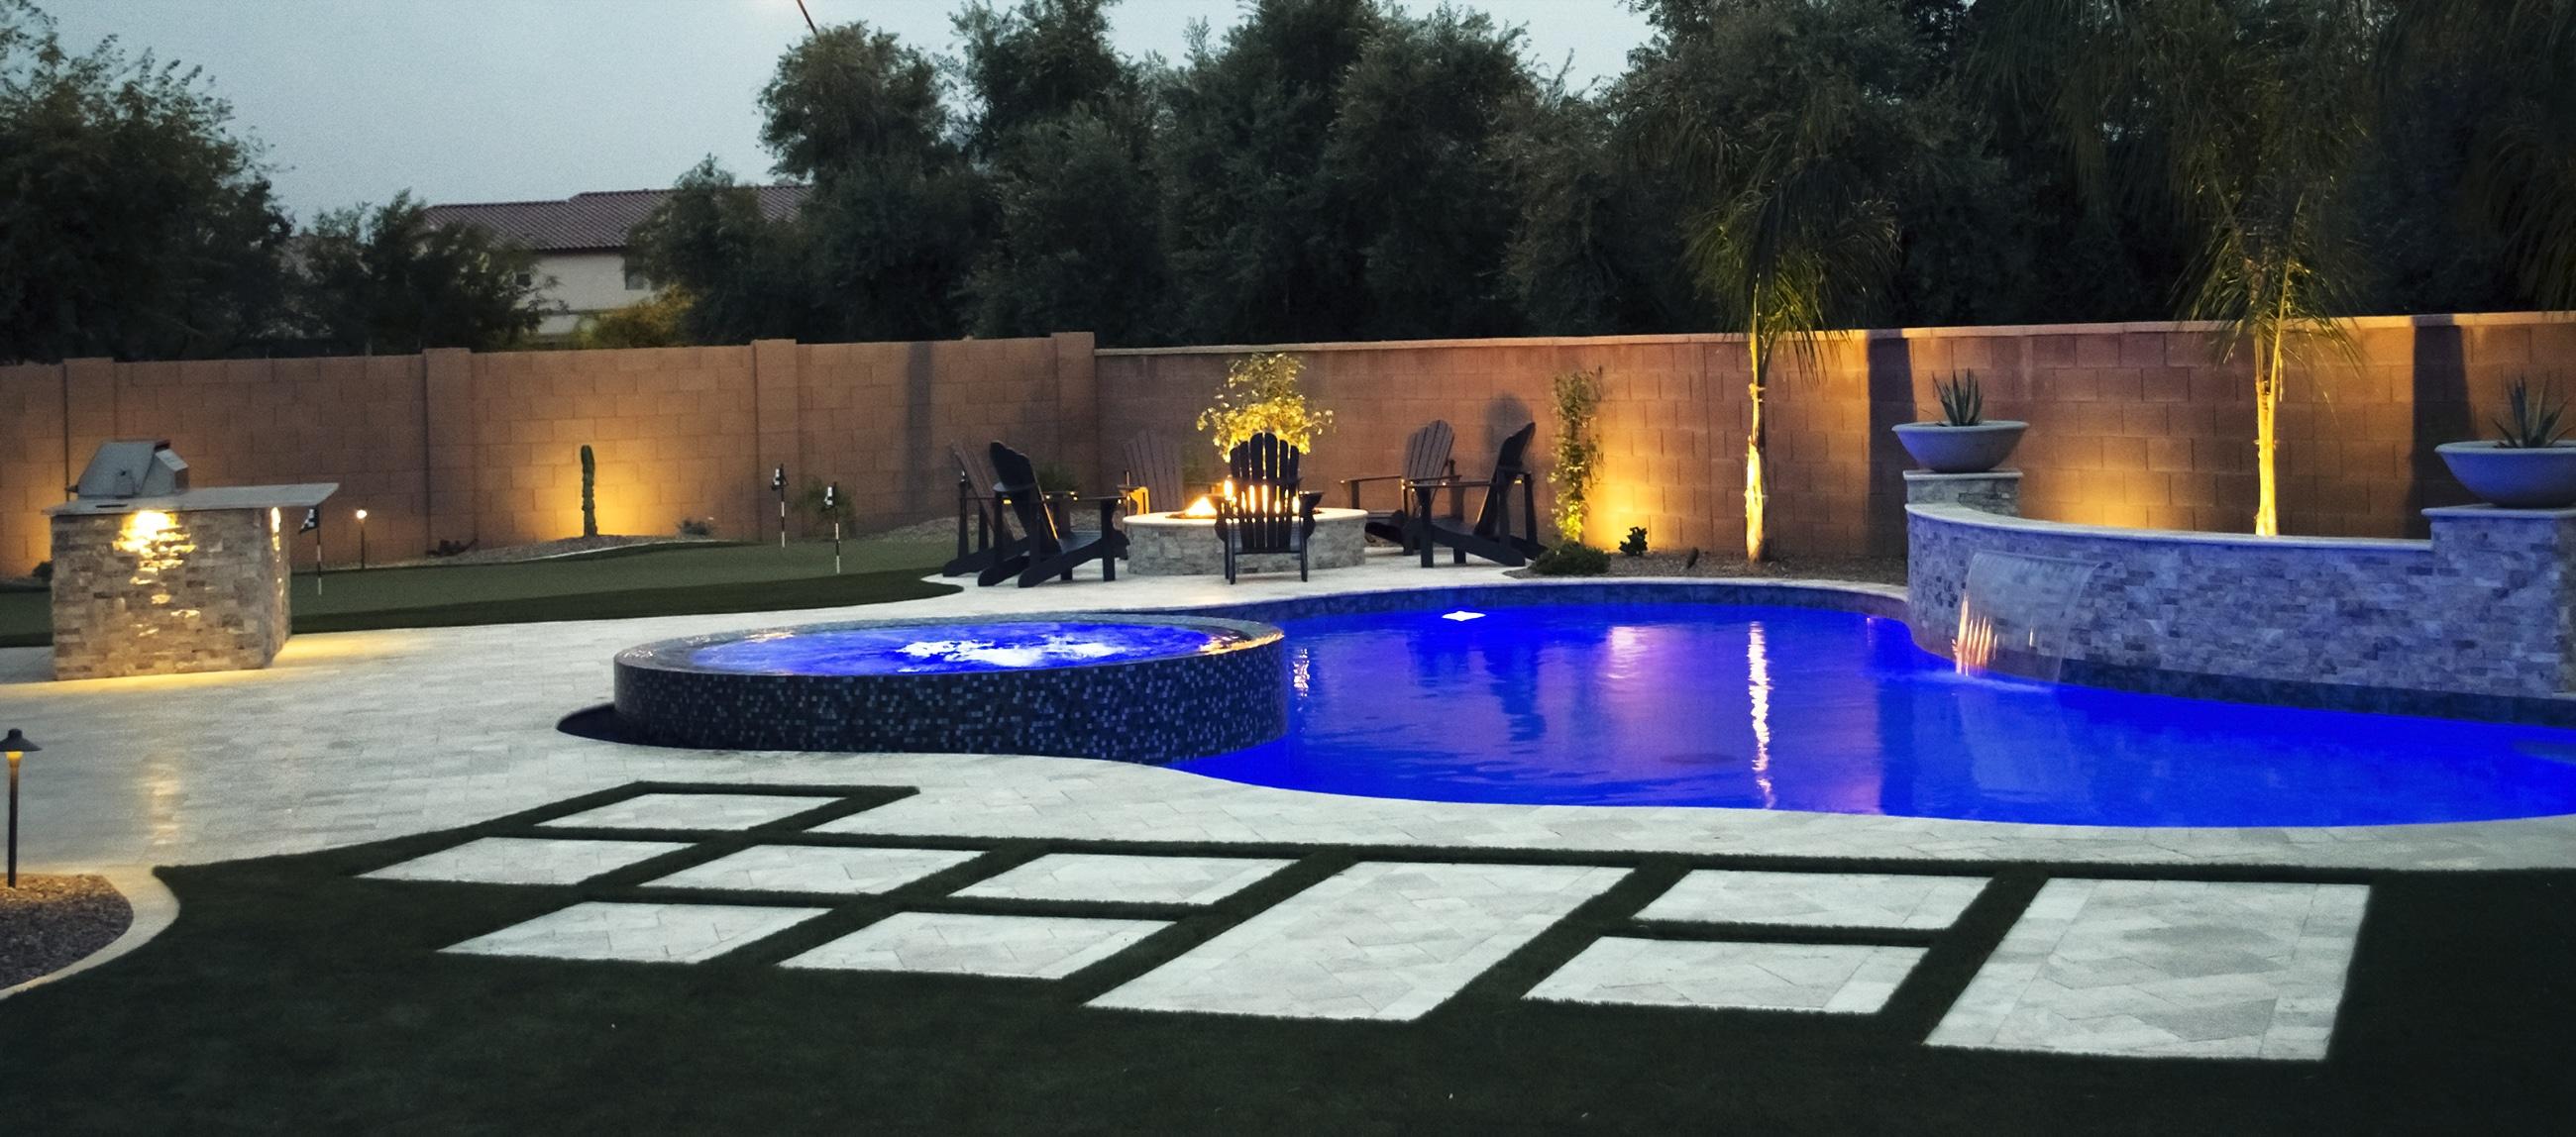 Top rated fast pool builders in east valley nuview for Pool builders queen creek az